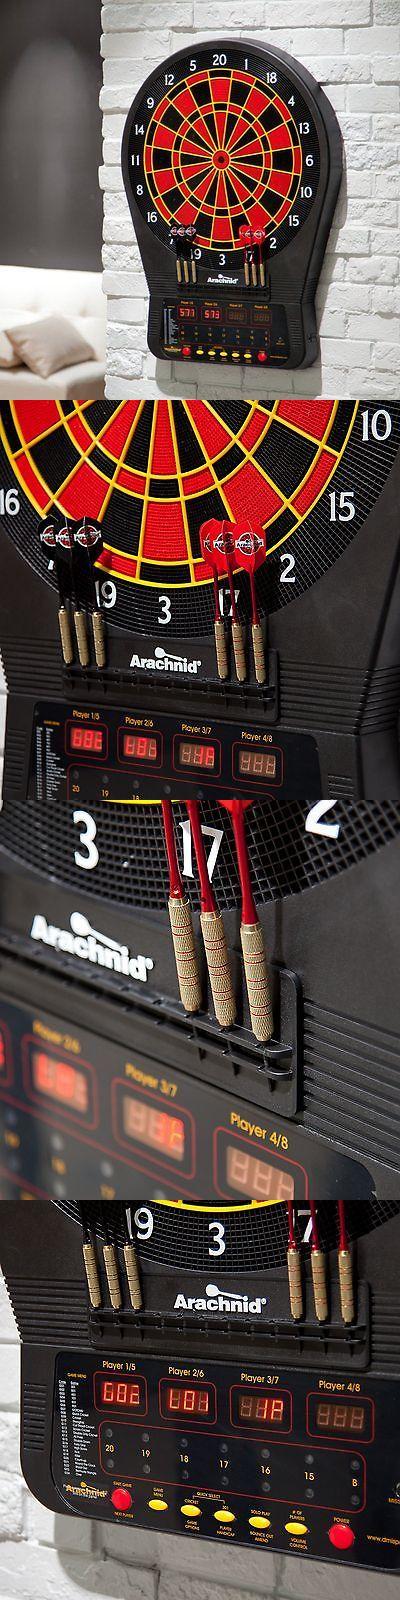 Dart Boards 72576: Arachnid Cricketpro 650 Electronic Dart Board And Darts Set, Black, 1 -> BUY IT NOW ONLY: $144.99 on eBay!